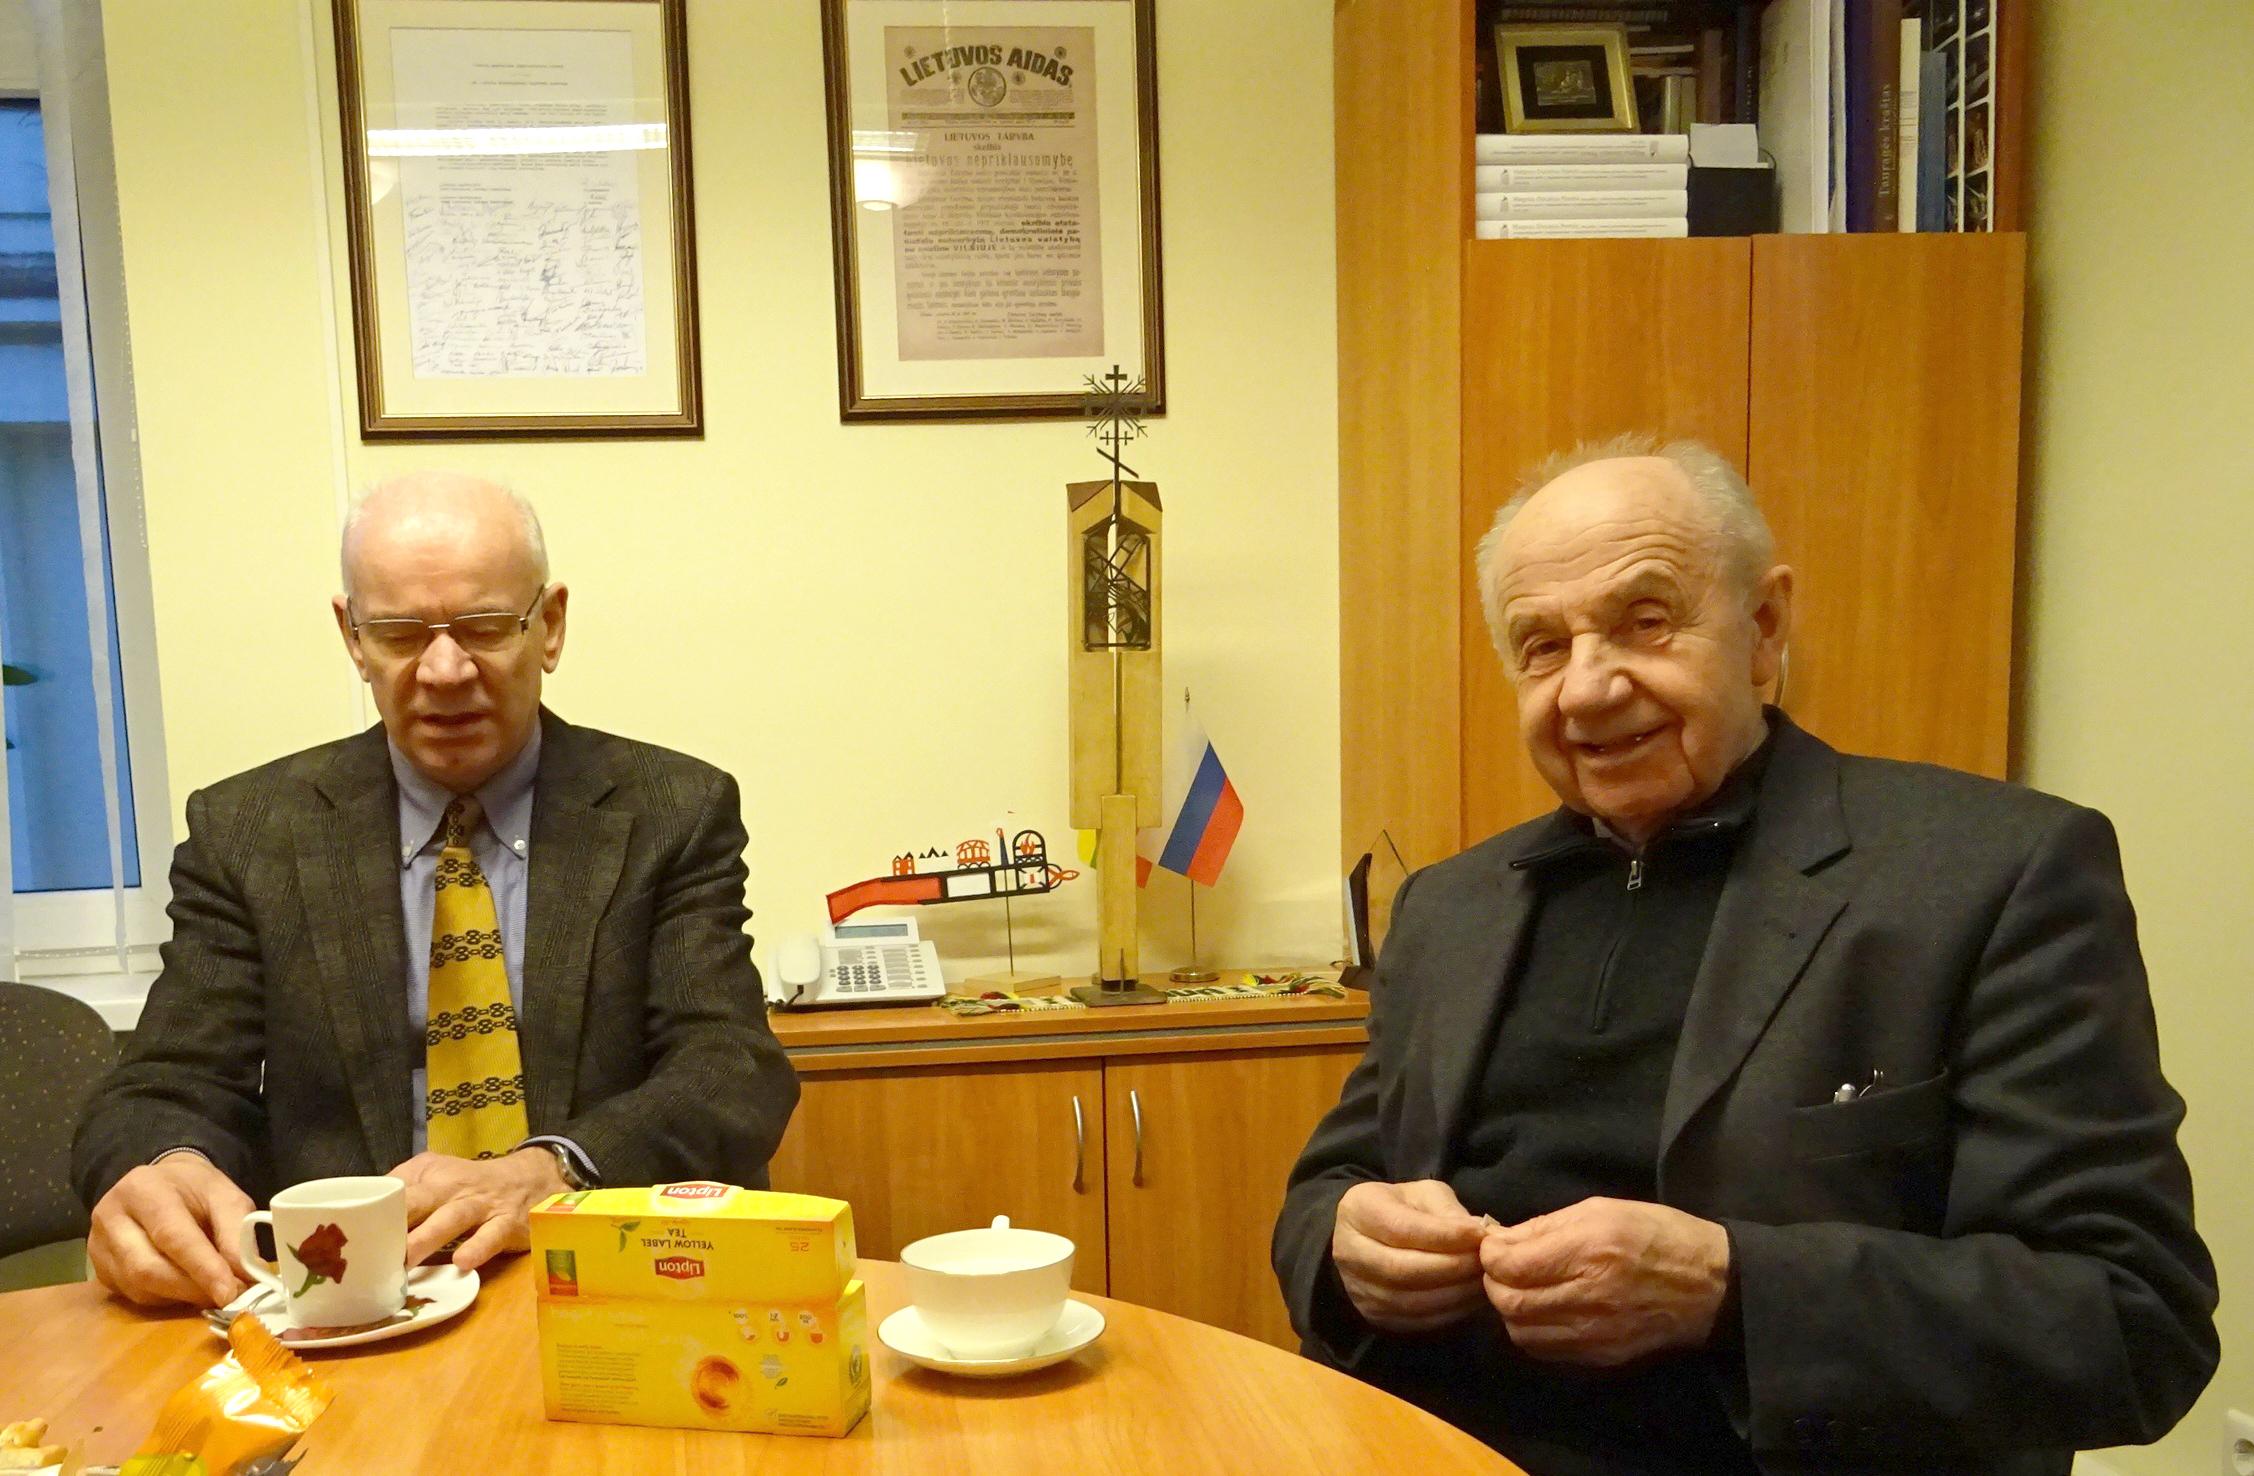 Malonus pokalbis Lietuvos konsulate Tilžėje su konsulu B. Makausku (kairėje) ir kunigu A. Gauronsku.